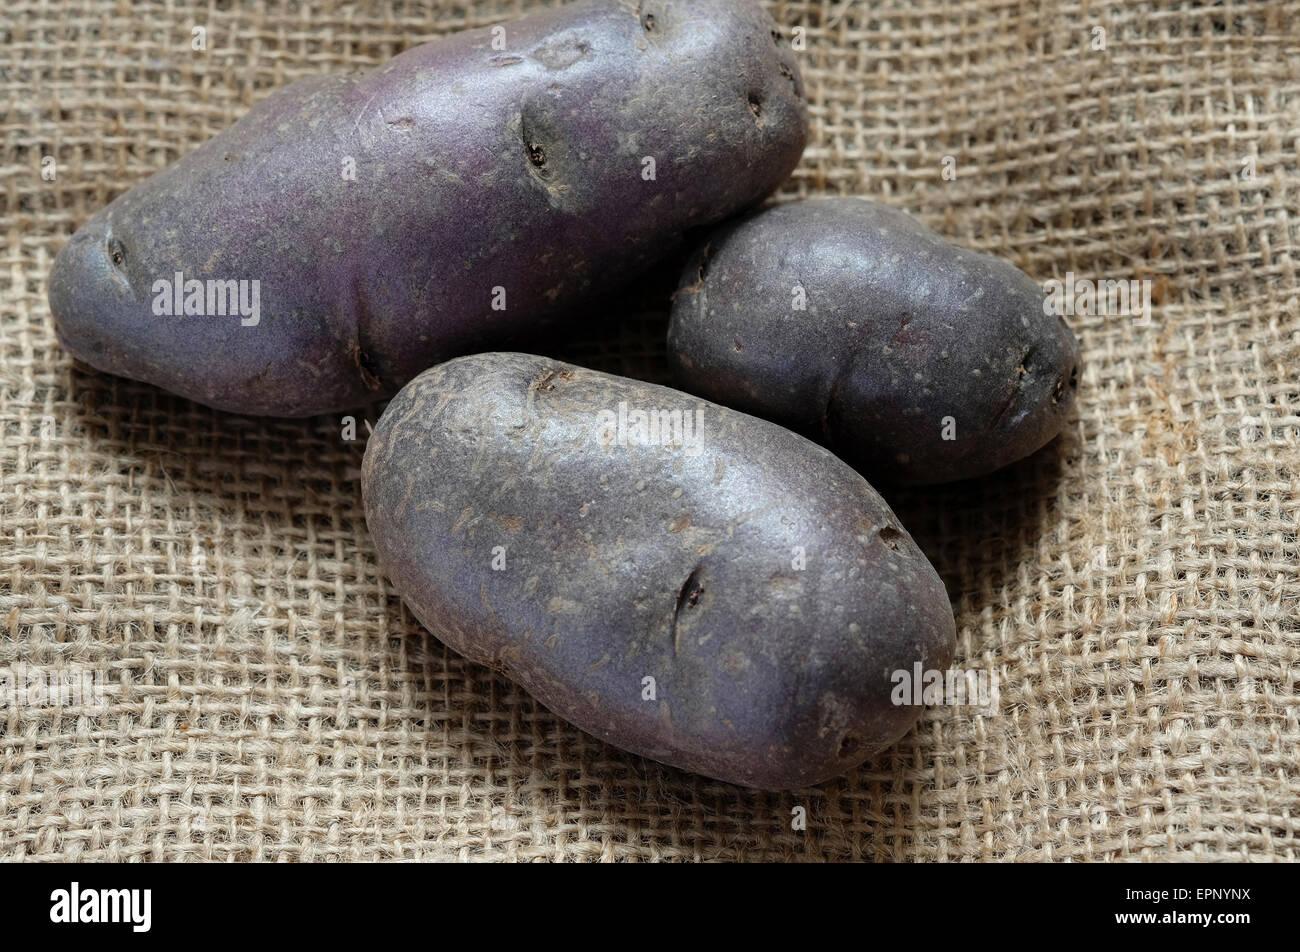 black skinned potatoes on old sack cloth - Stock Image